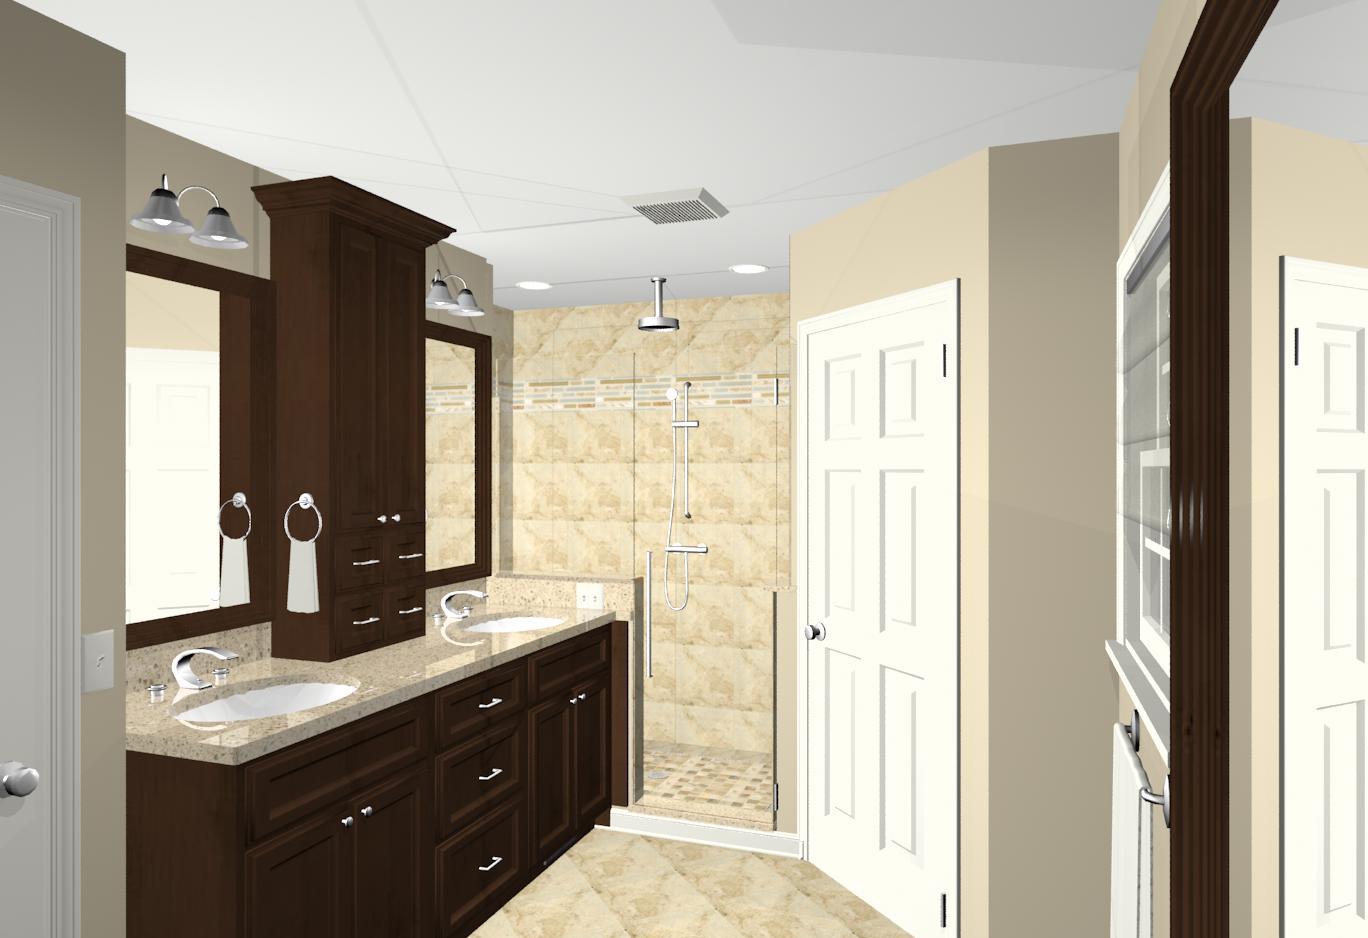 Morris county nj bathroom remodeling contractors and for Colonial bathroom ideas